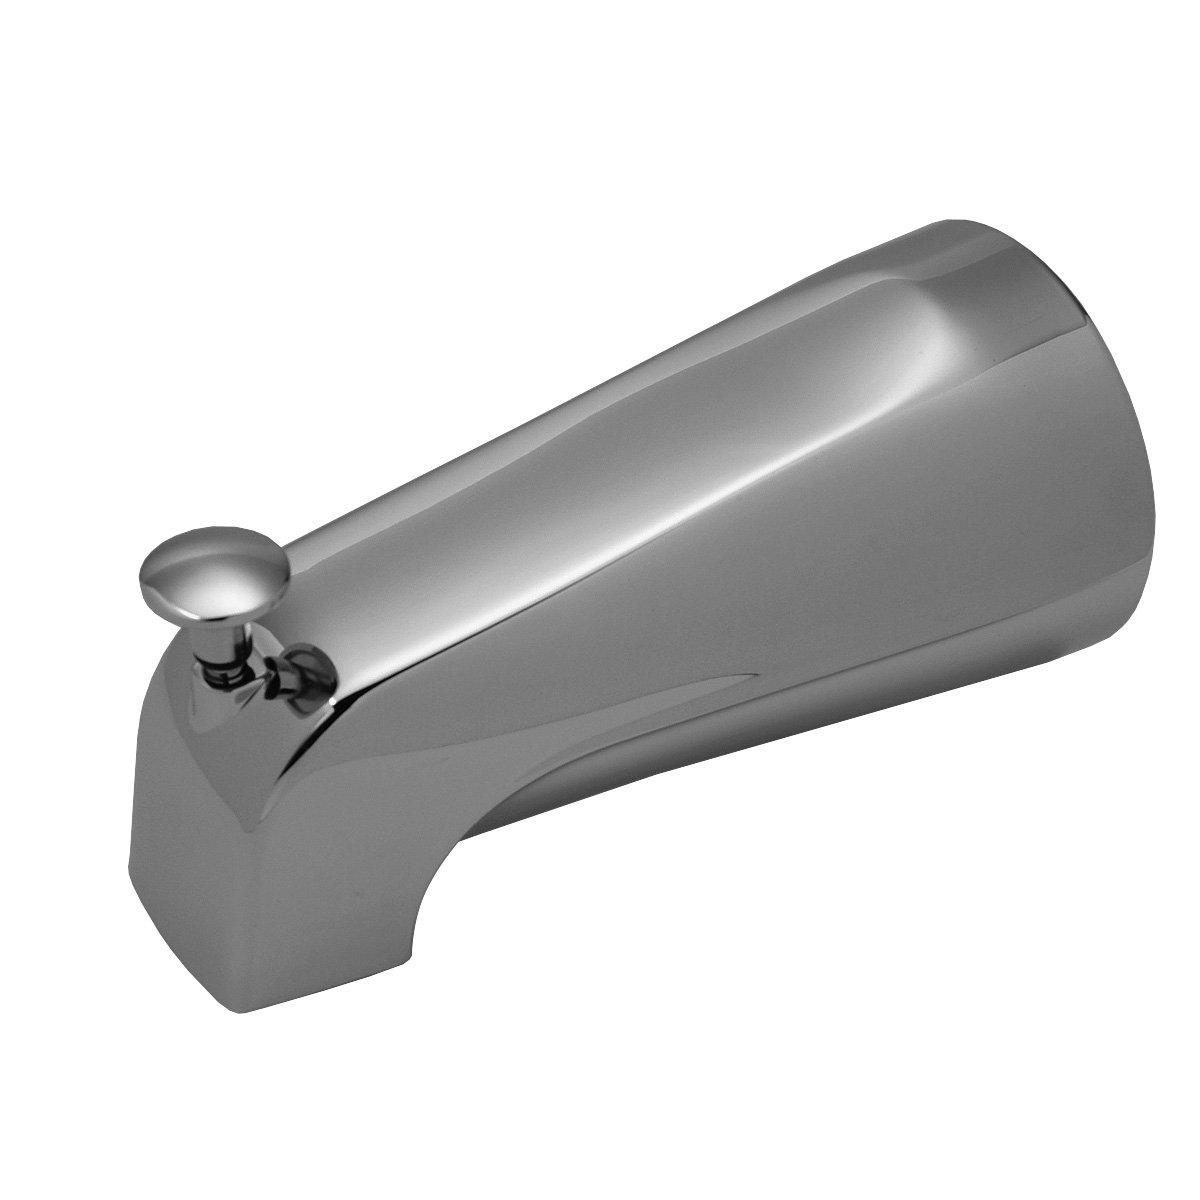 Brasscraft Swd0424 Mixet 64 Bulk 51/8'' Iron Pipe Diverter Tub Spout, Chrome